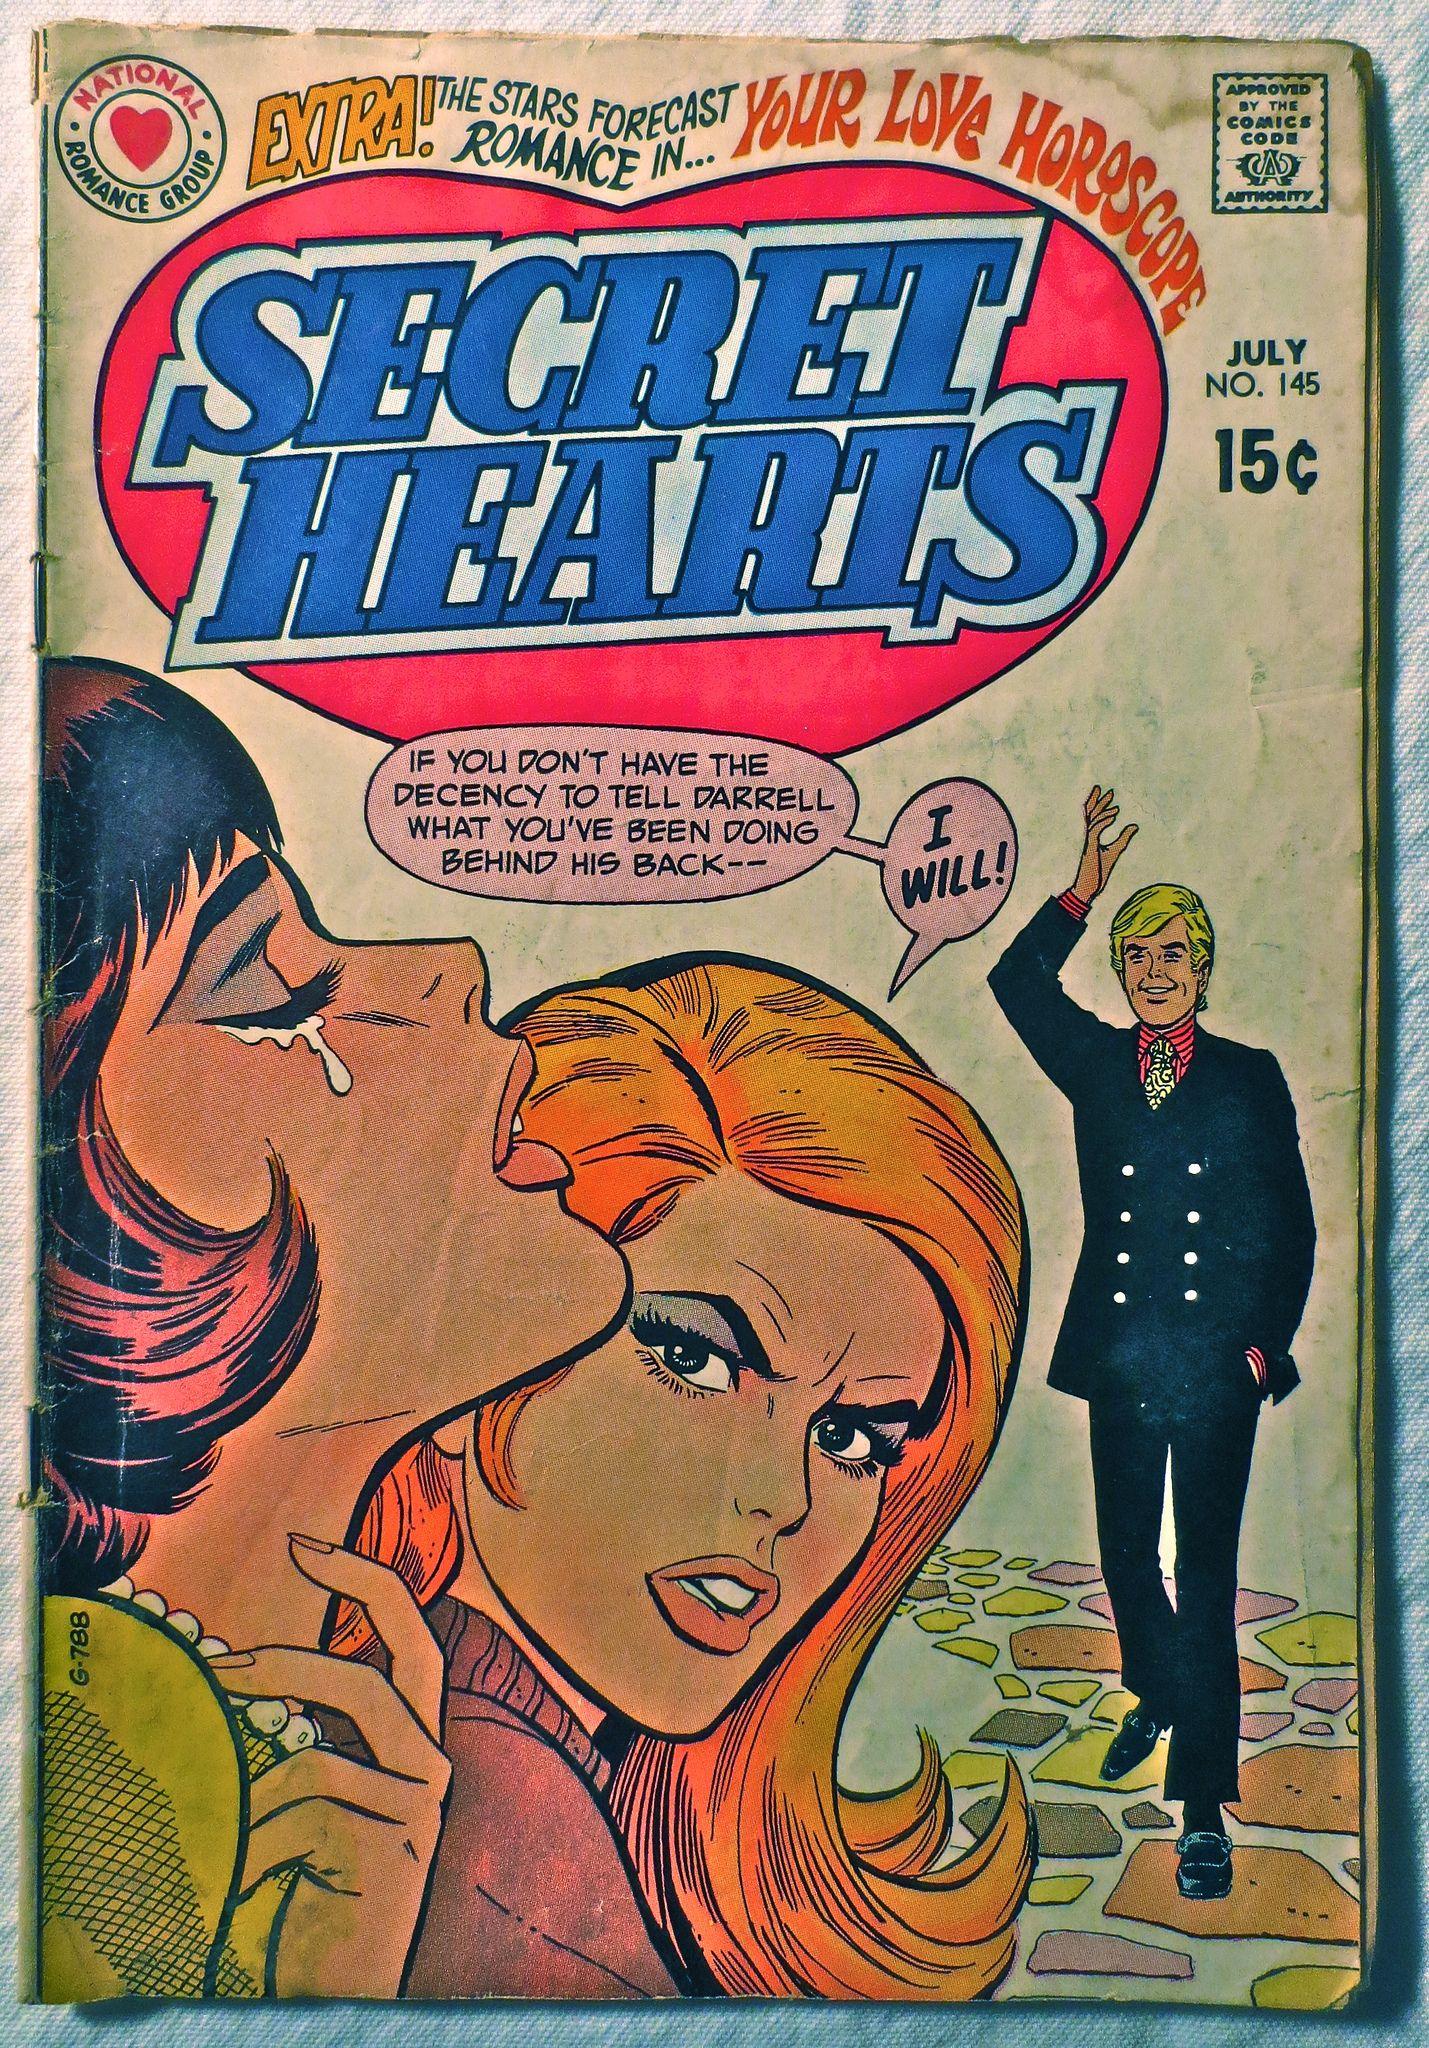 1970s Secret Hearts 1970 Vintage Comic Book Comics Vintage Comics Vintage Comic Books Old Comic Books